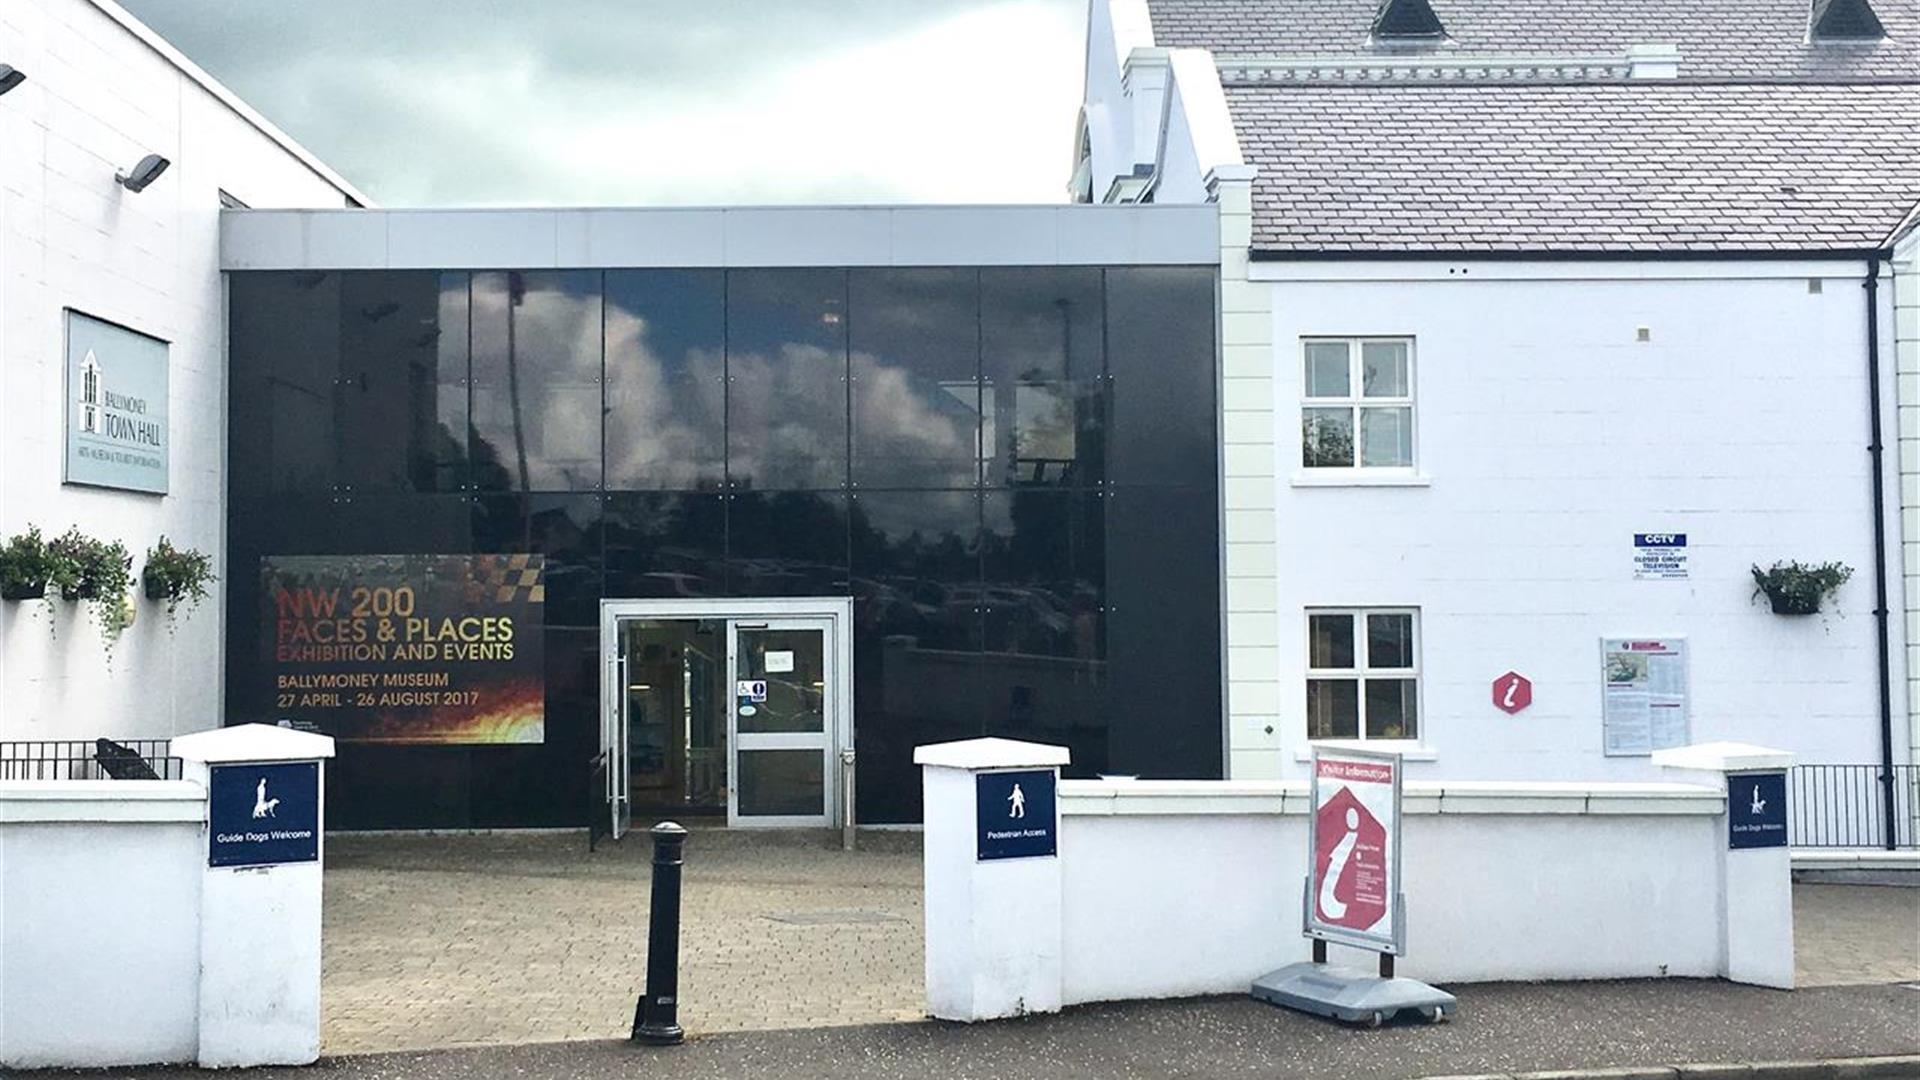 Ballymoney Visitor Information Centre